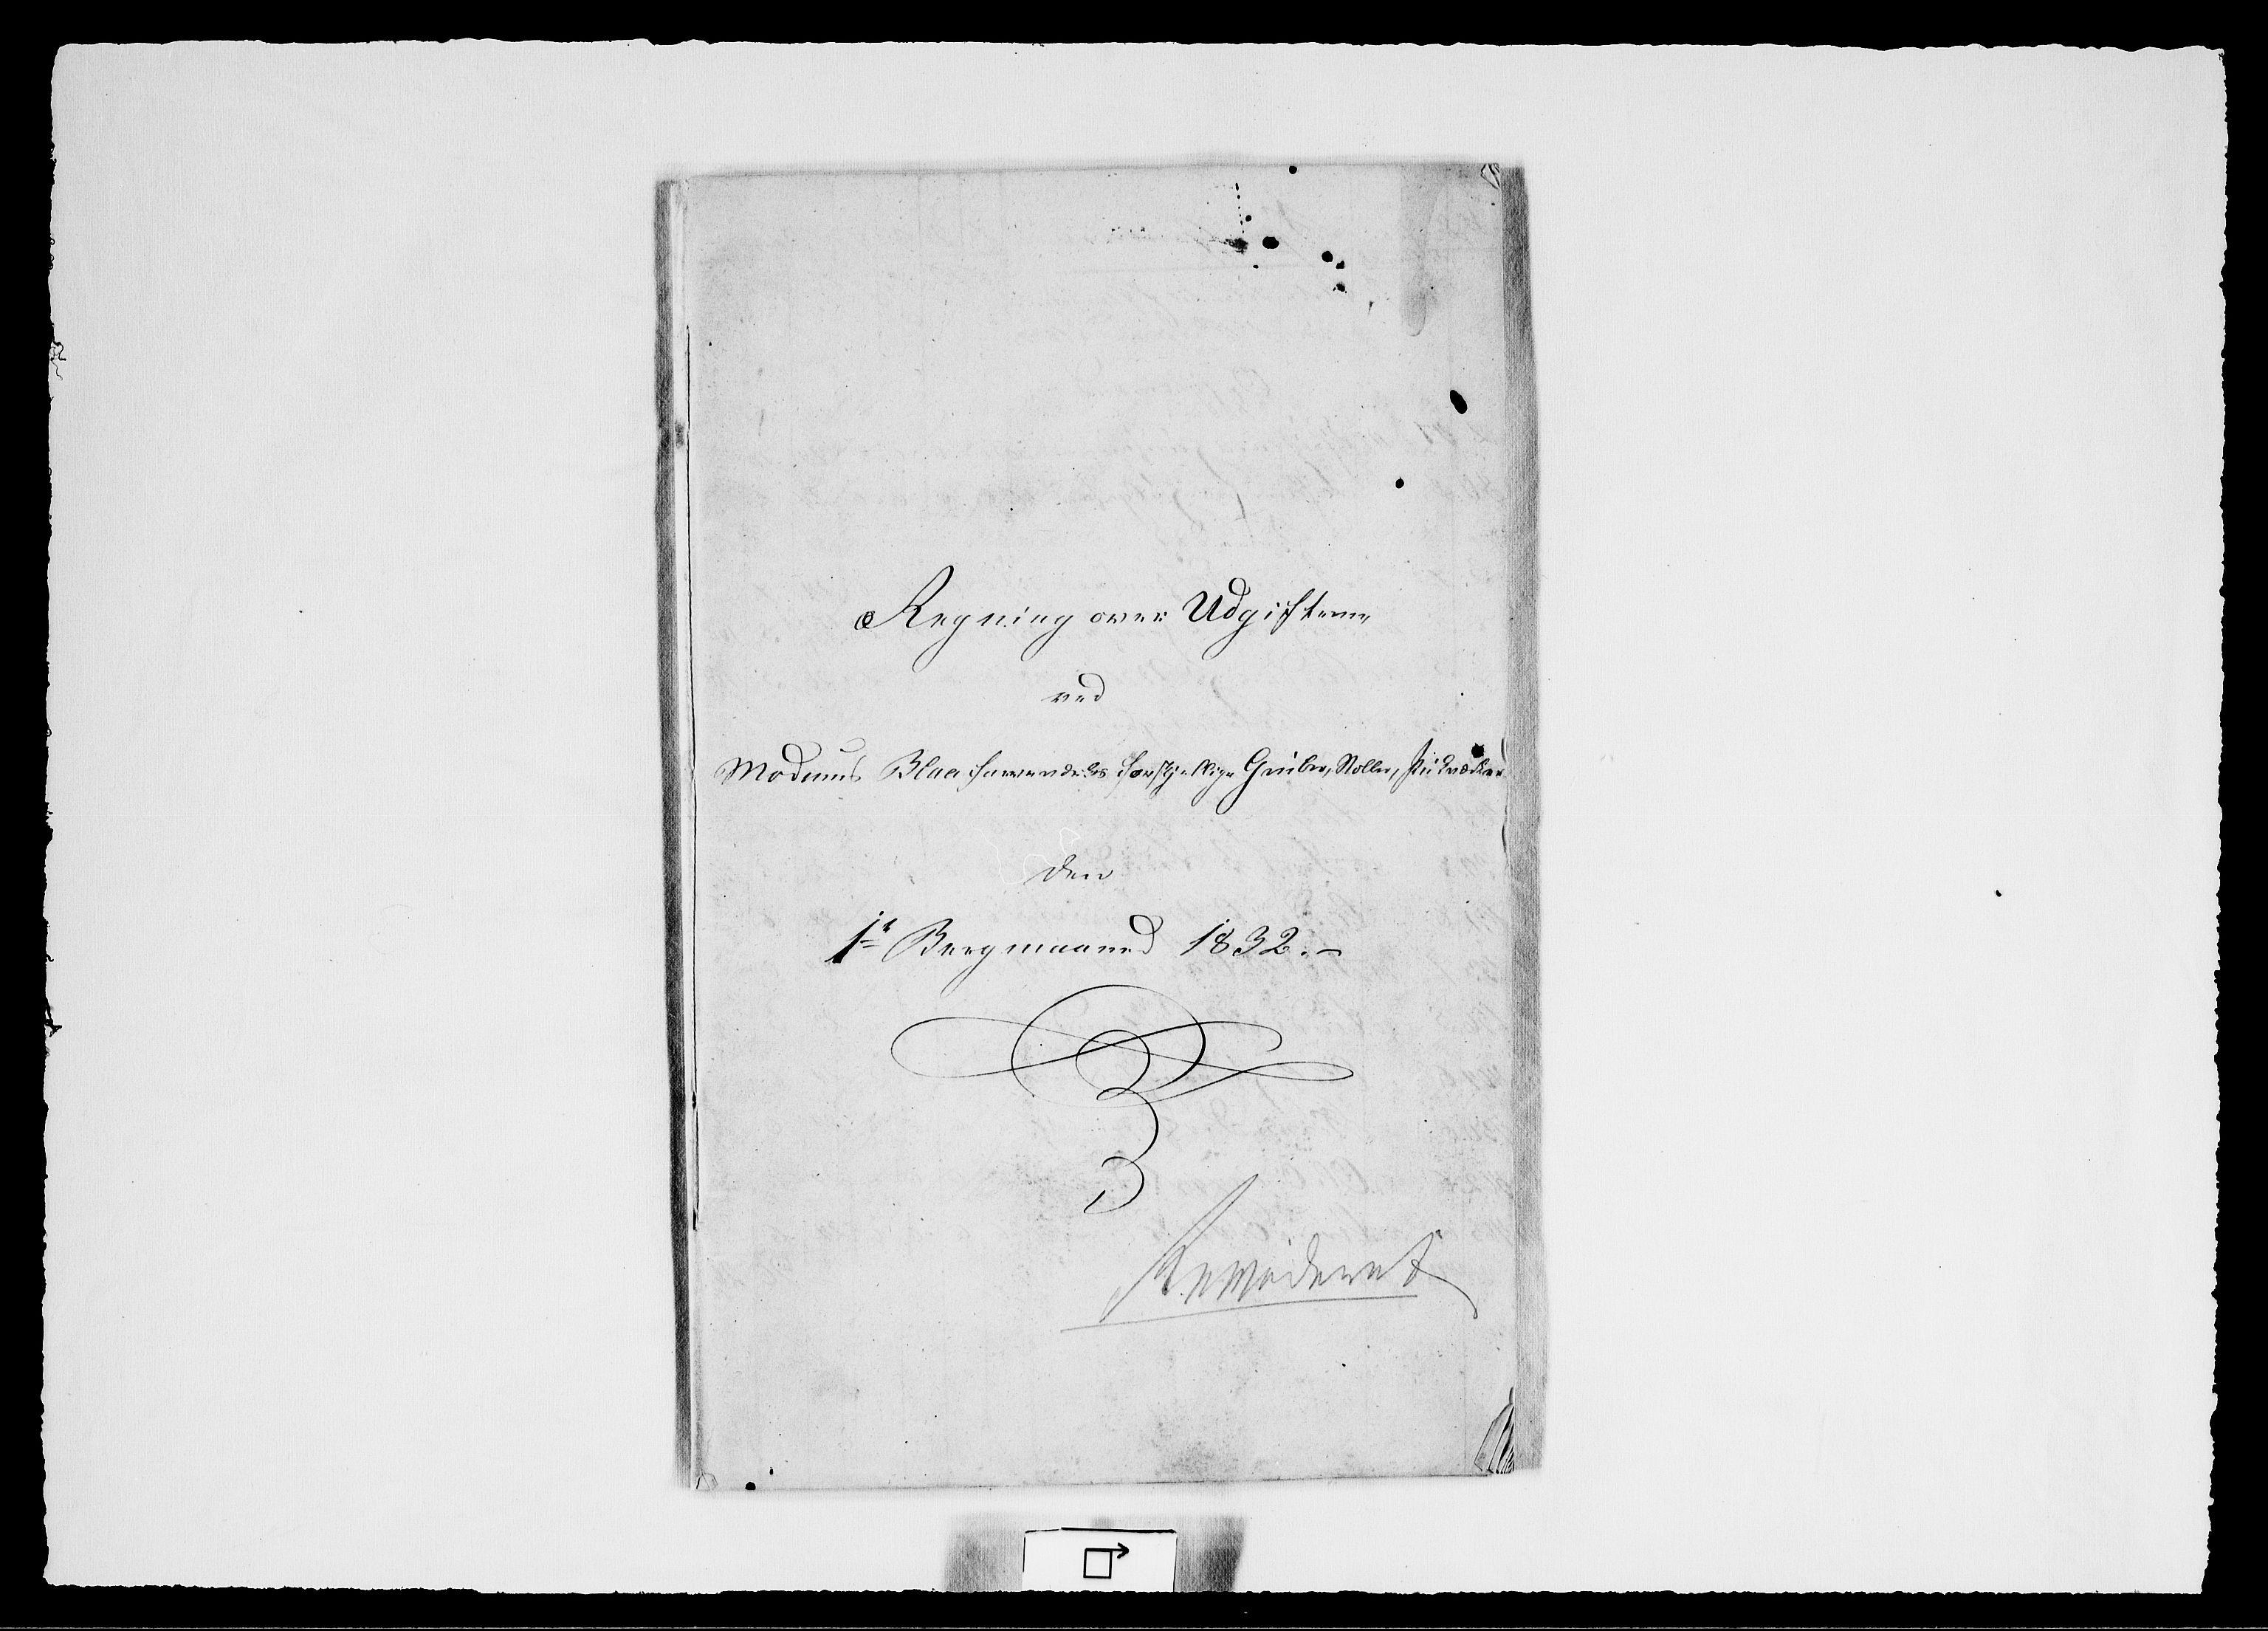 RA, Modums Blaafarveværk, G/Gd/Gdd/L0259, 1832, s. 2